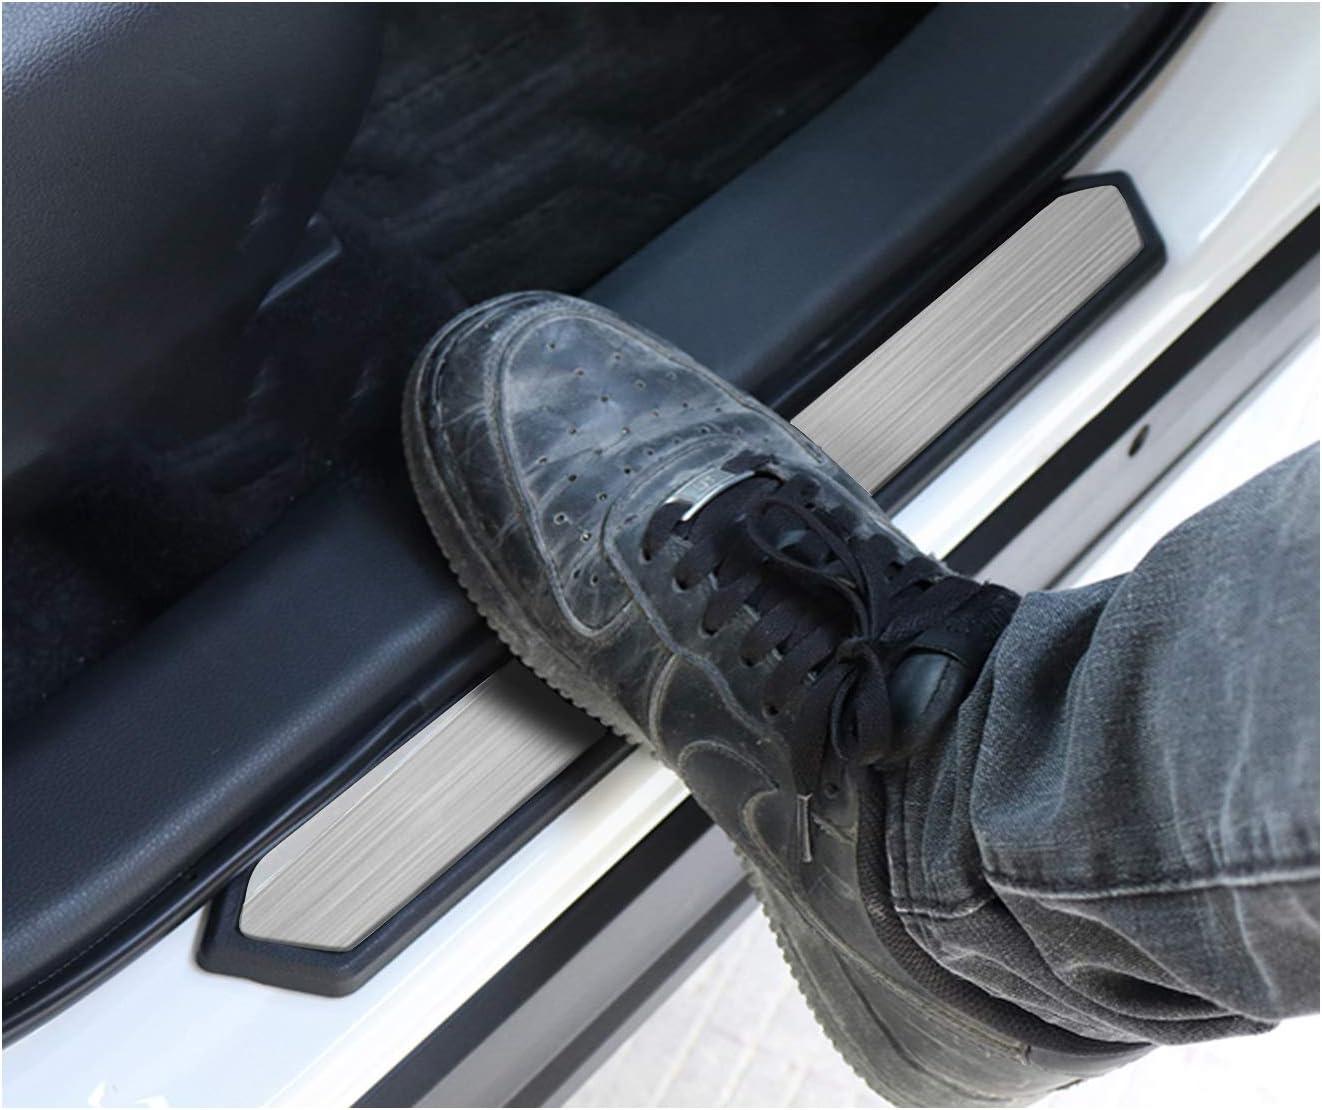 RAV4 Interior Accessories,RAV4 Door Sill Protector Compatible for Toyota Rav4 2019 2020,RAV4 Door Step Plate,RAV4 Protecte Door Entry Paint Off